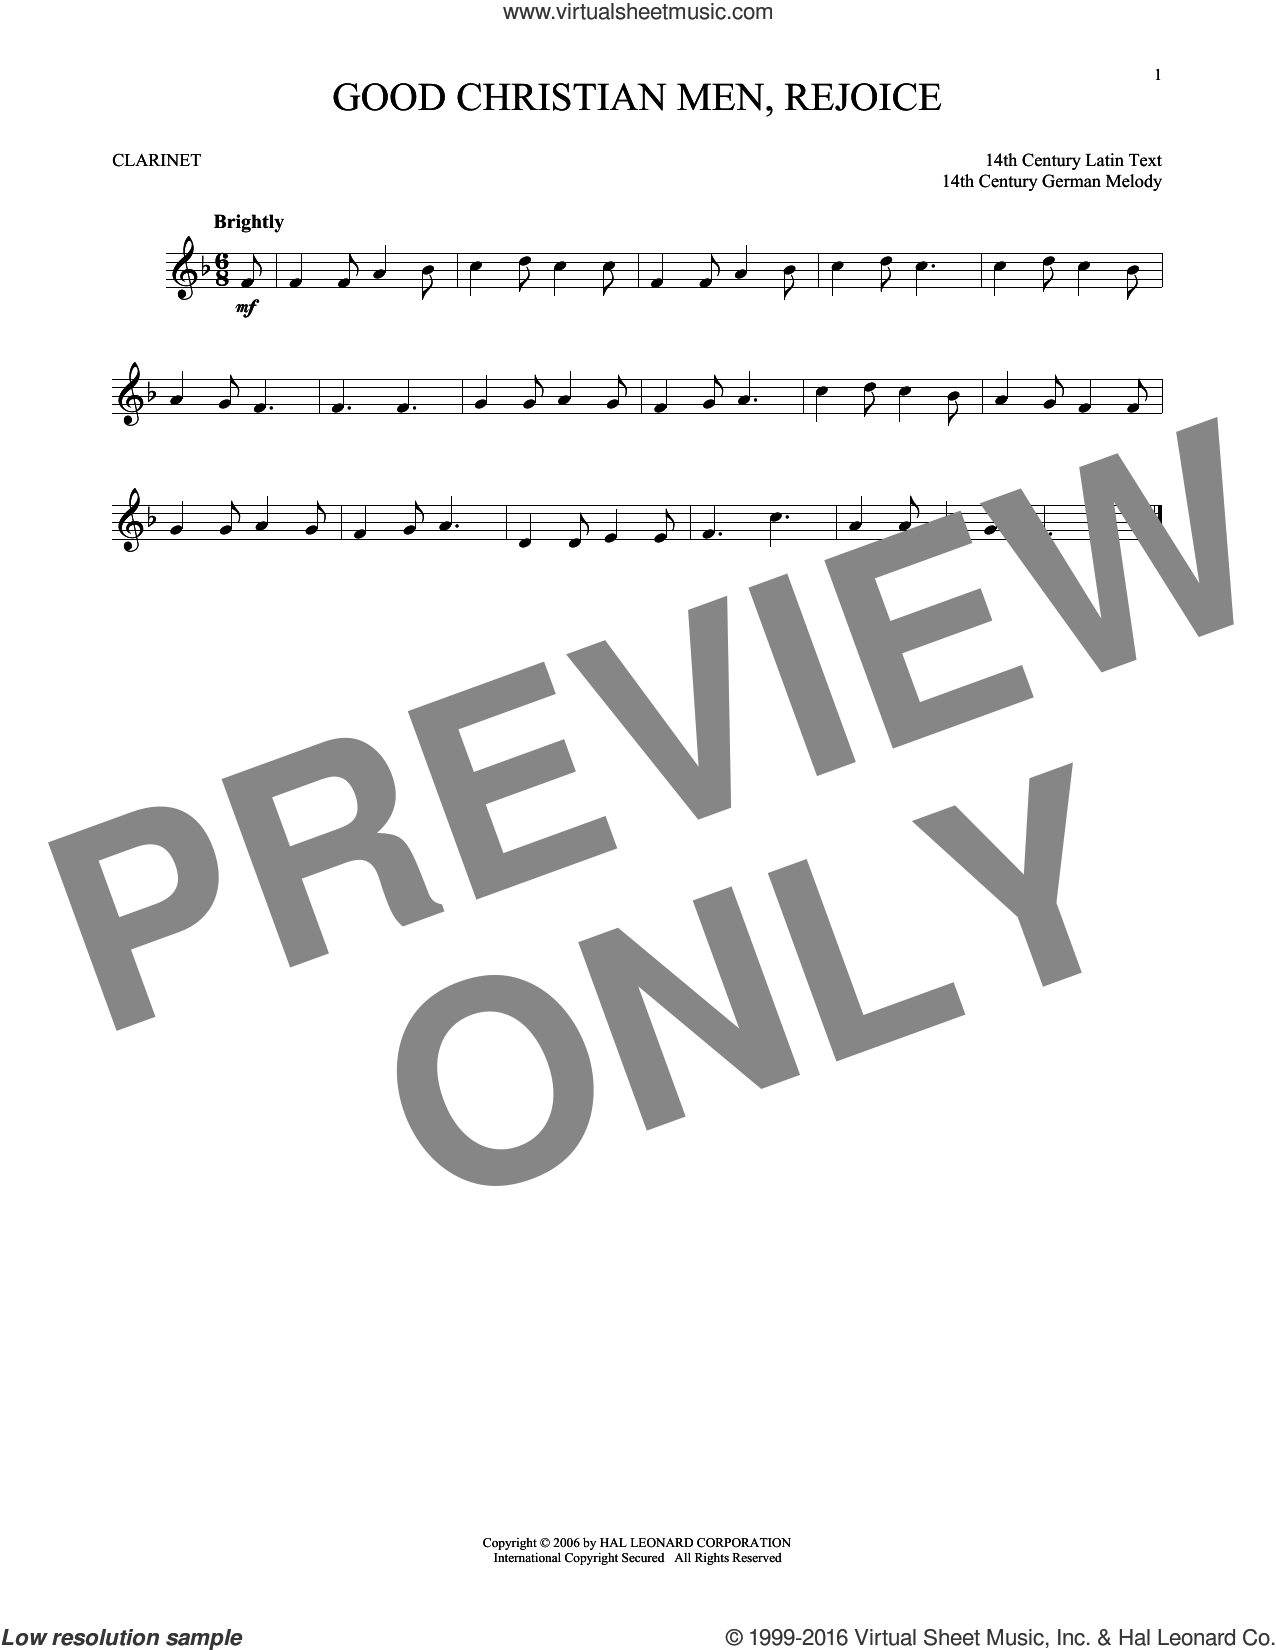 Good Christian Men, Rejoice sheet music for clarinet solo by John Mason Neale and Miscellaneous, intermediate skill level